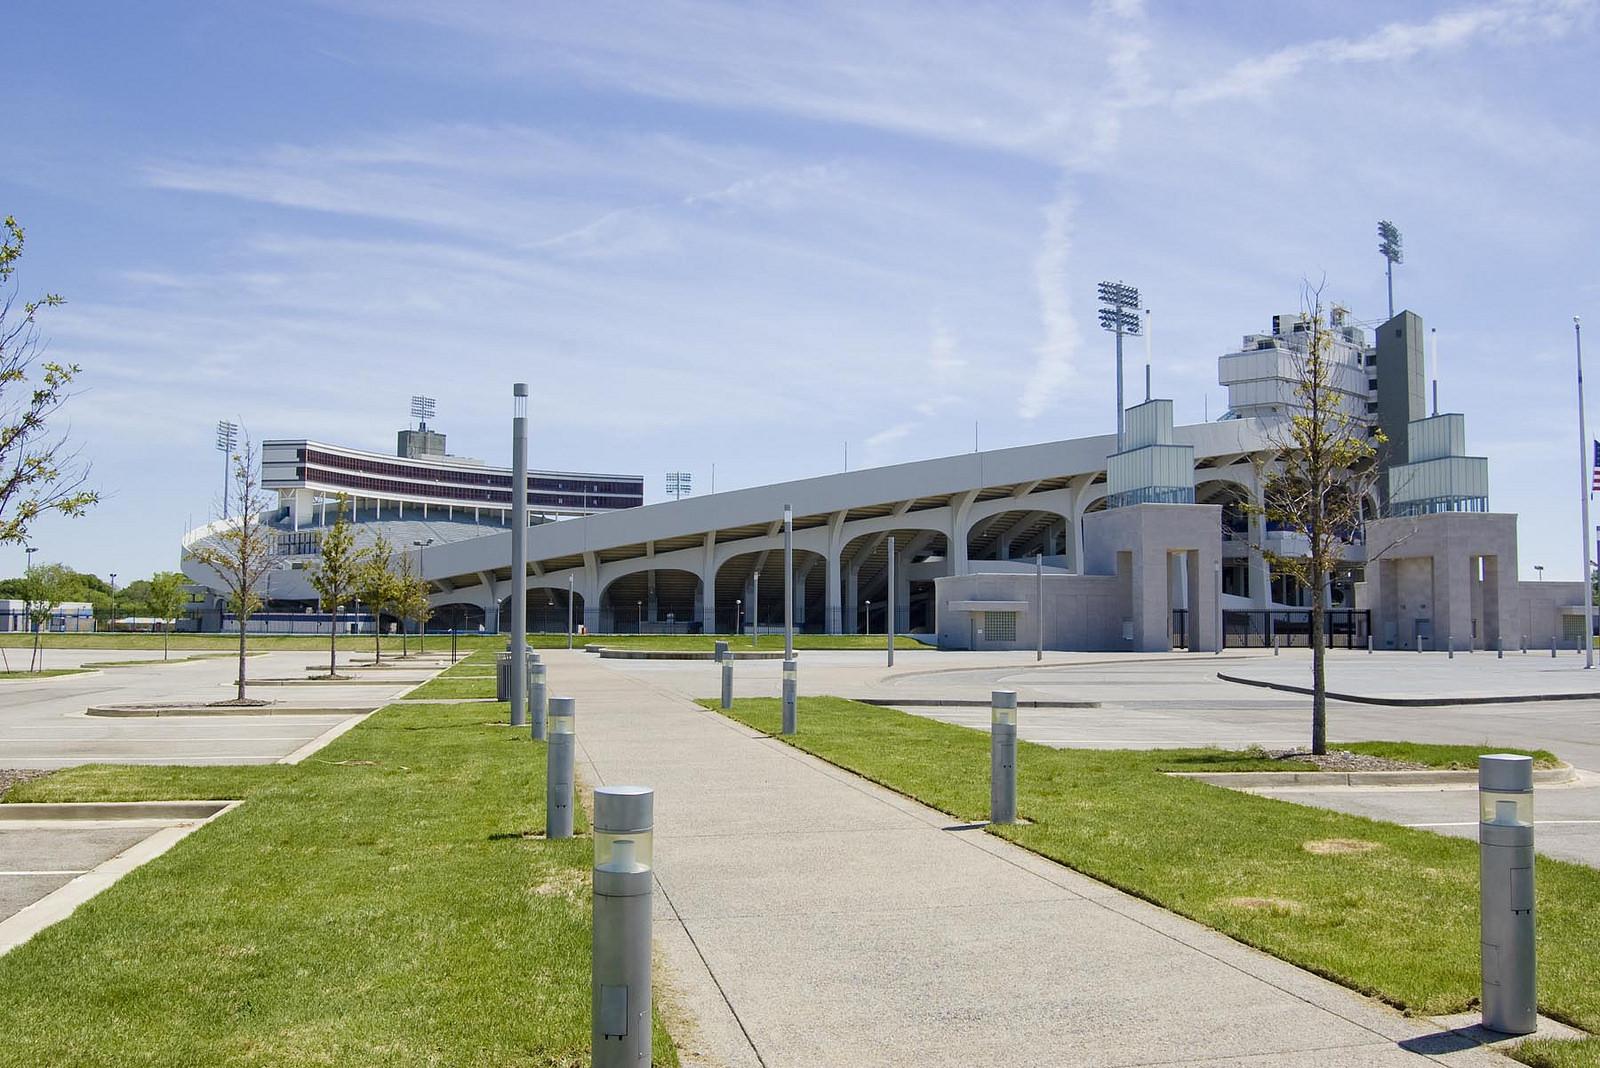 Memphis Tigers Tiger Lane at Liberty Bowl Memorial Stadium